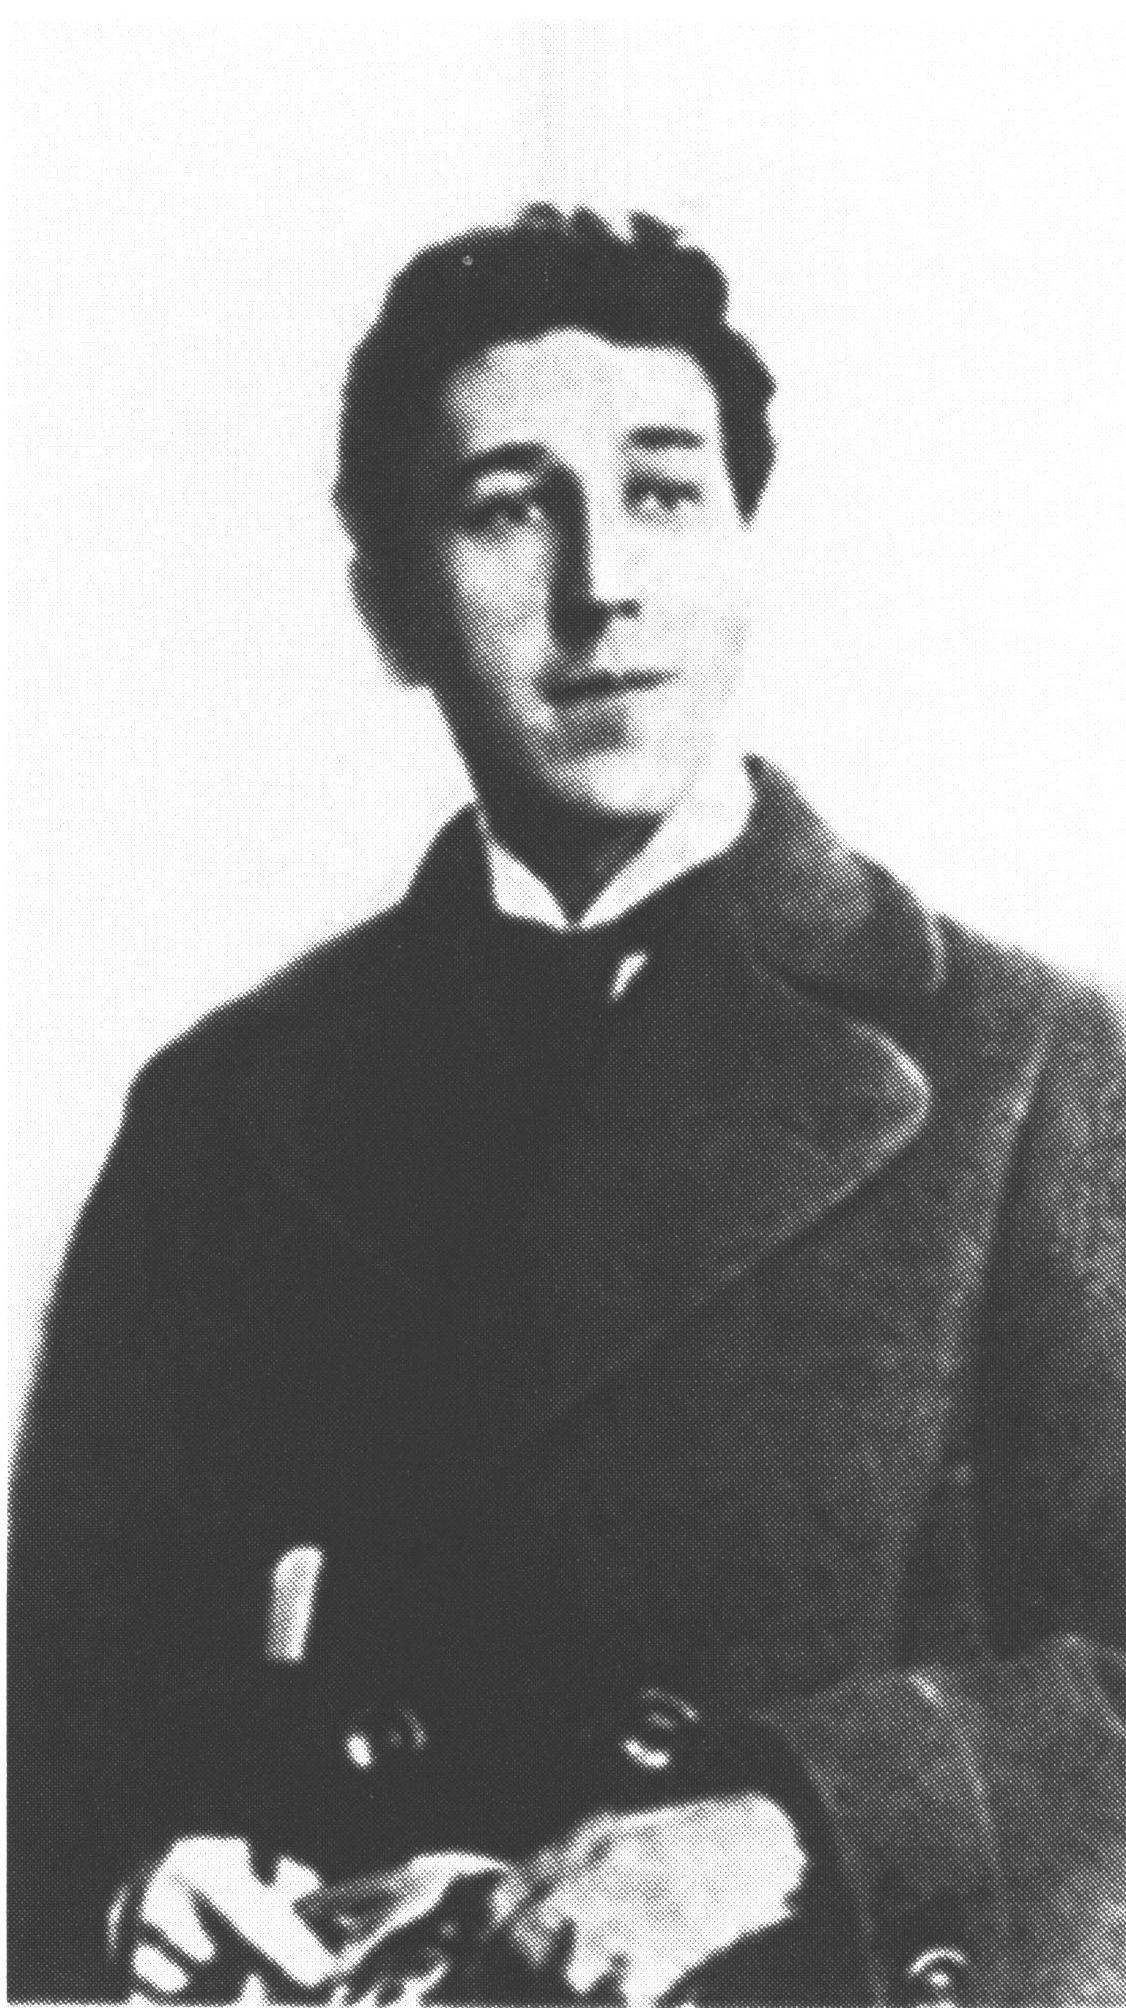 Игорь Северянин, начало 1910-х. Источник фото: www.poet-severyanin.ru